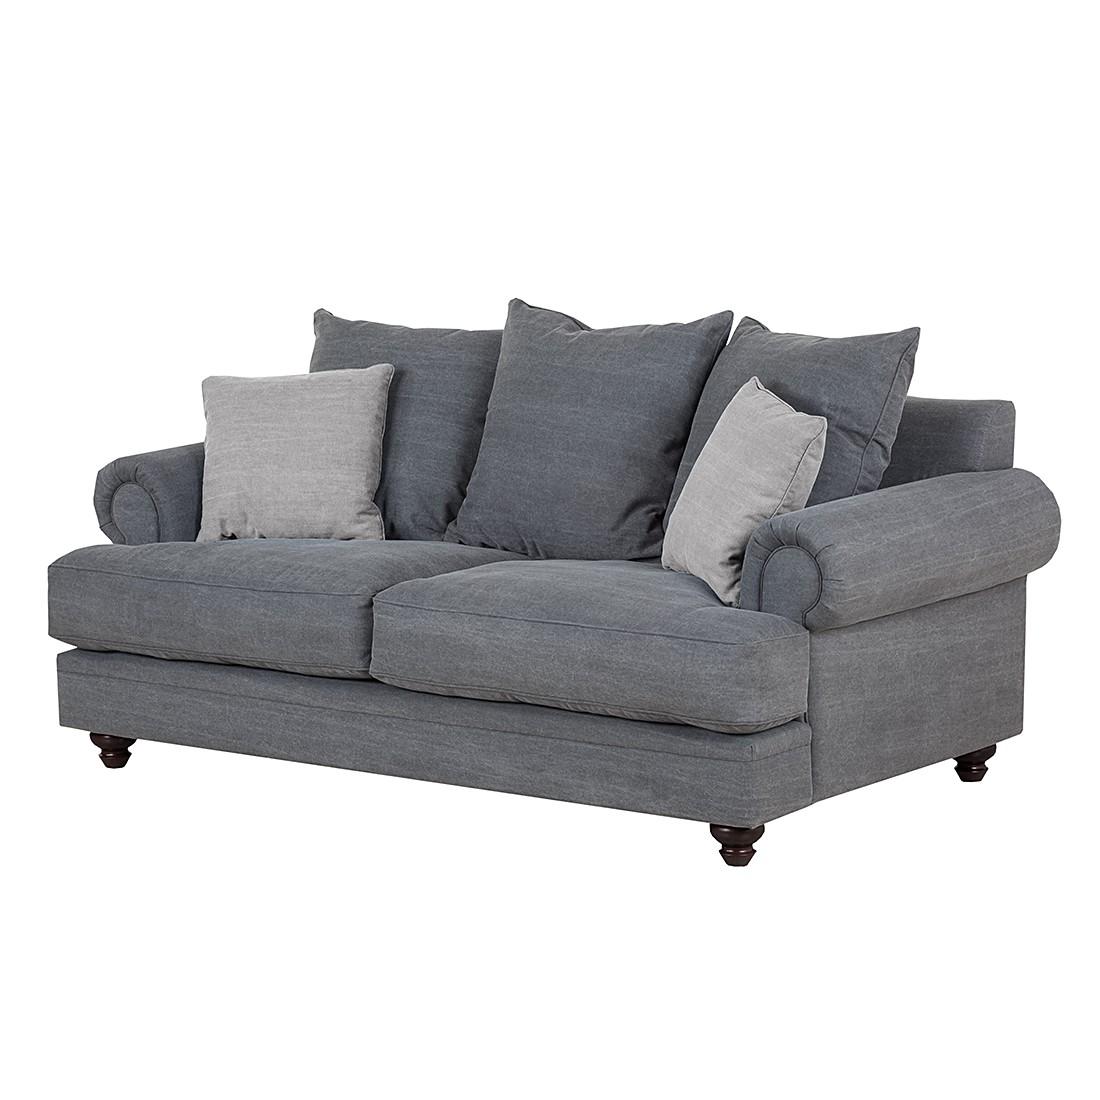 Sofa Davido (2-Sitzer) - Baumwollstoff - Anthrazit, Naturoo